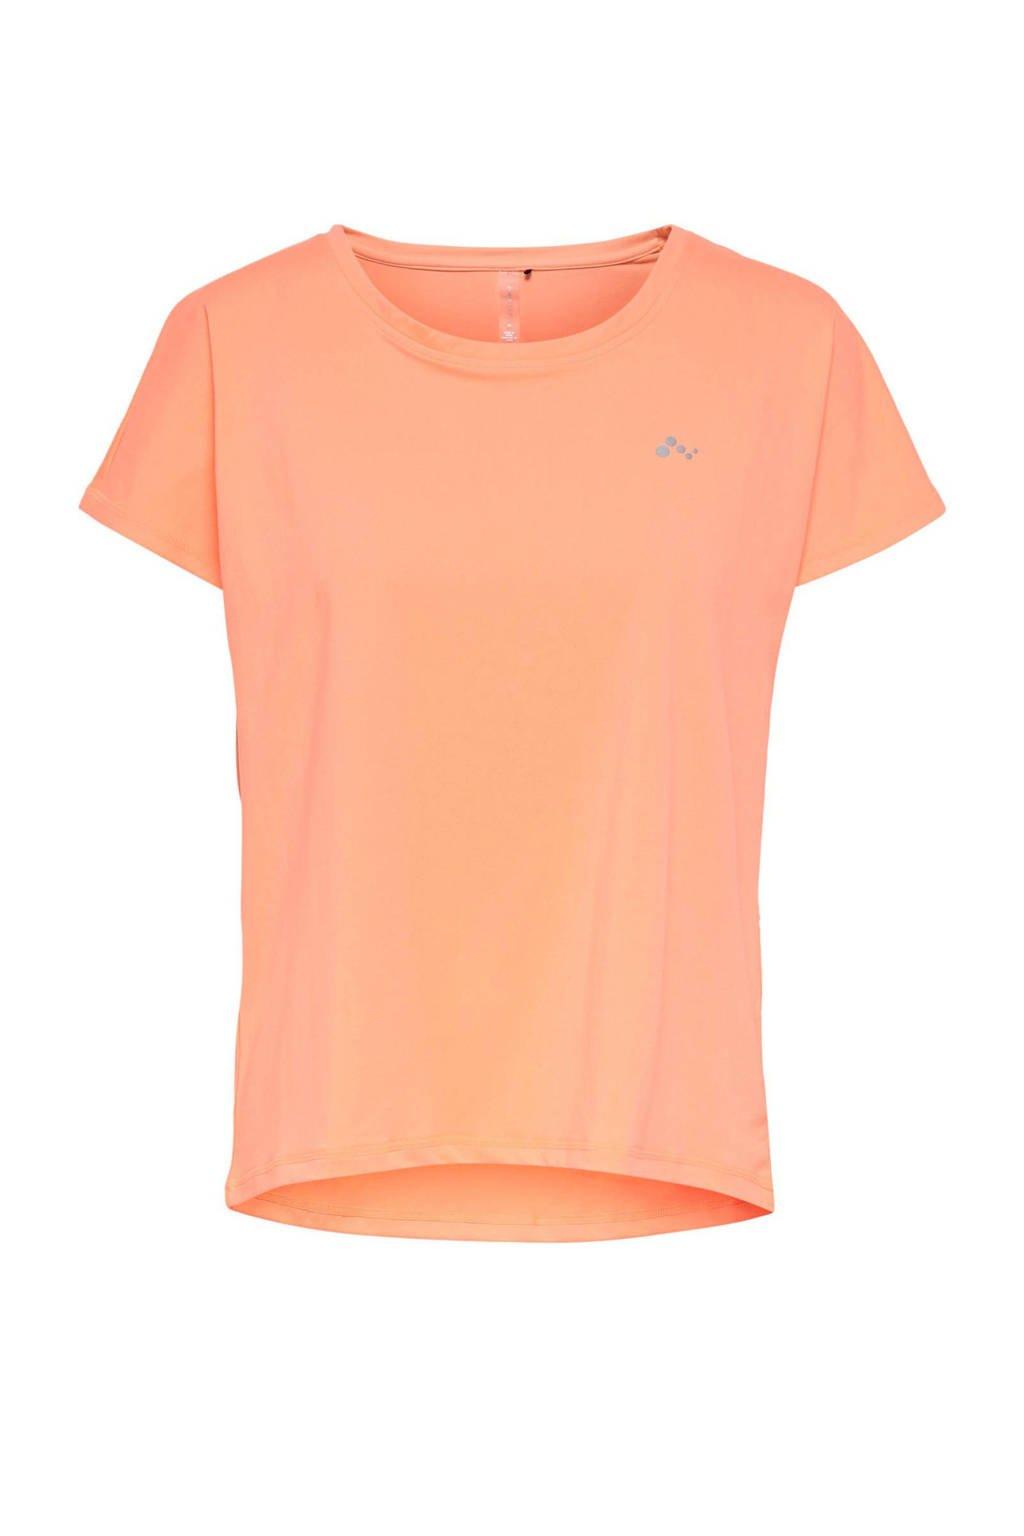 ONLY PLAY sport T-shirt Aubree oranje, Oranje